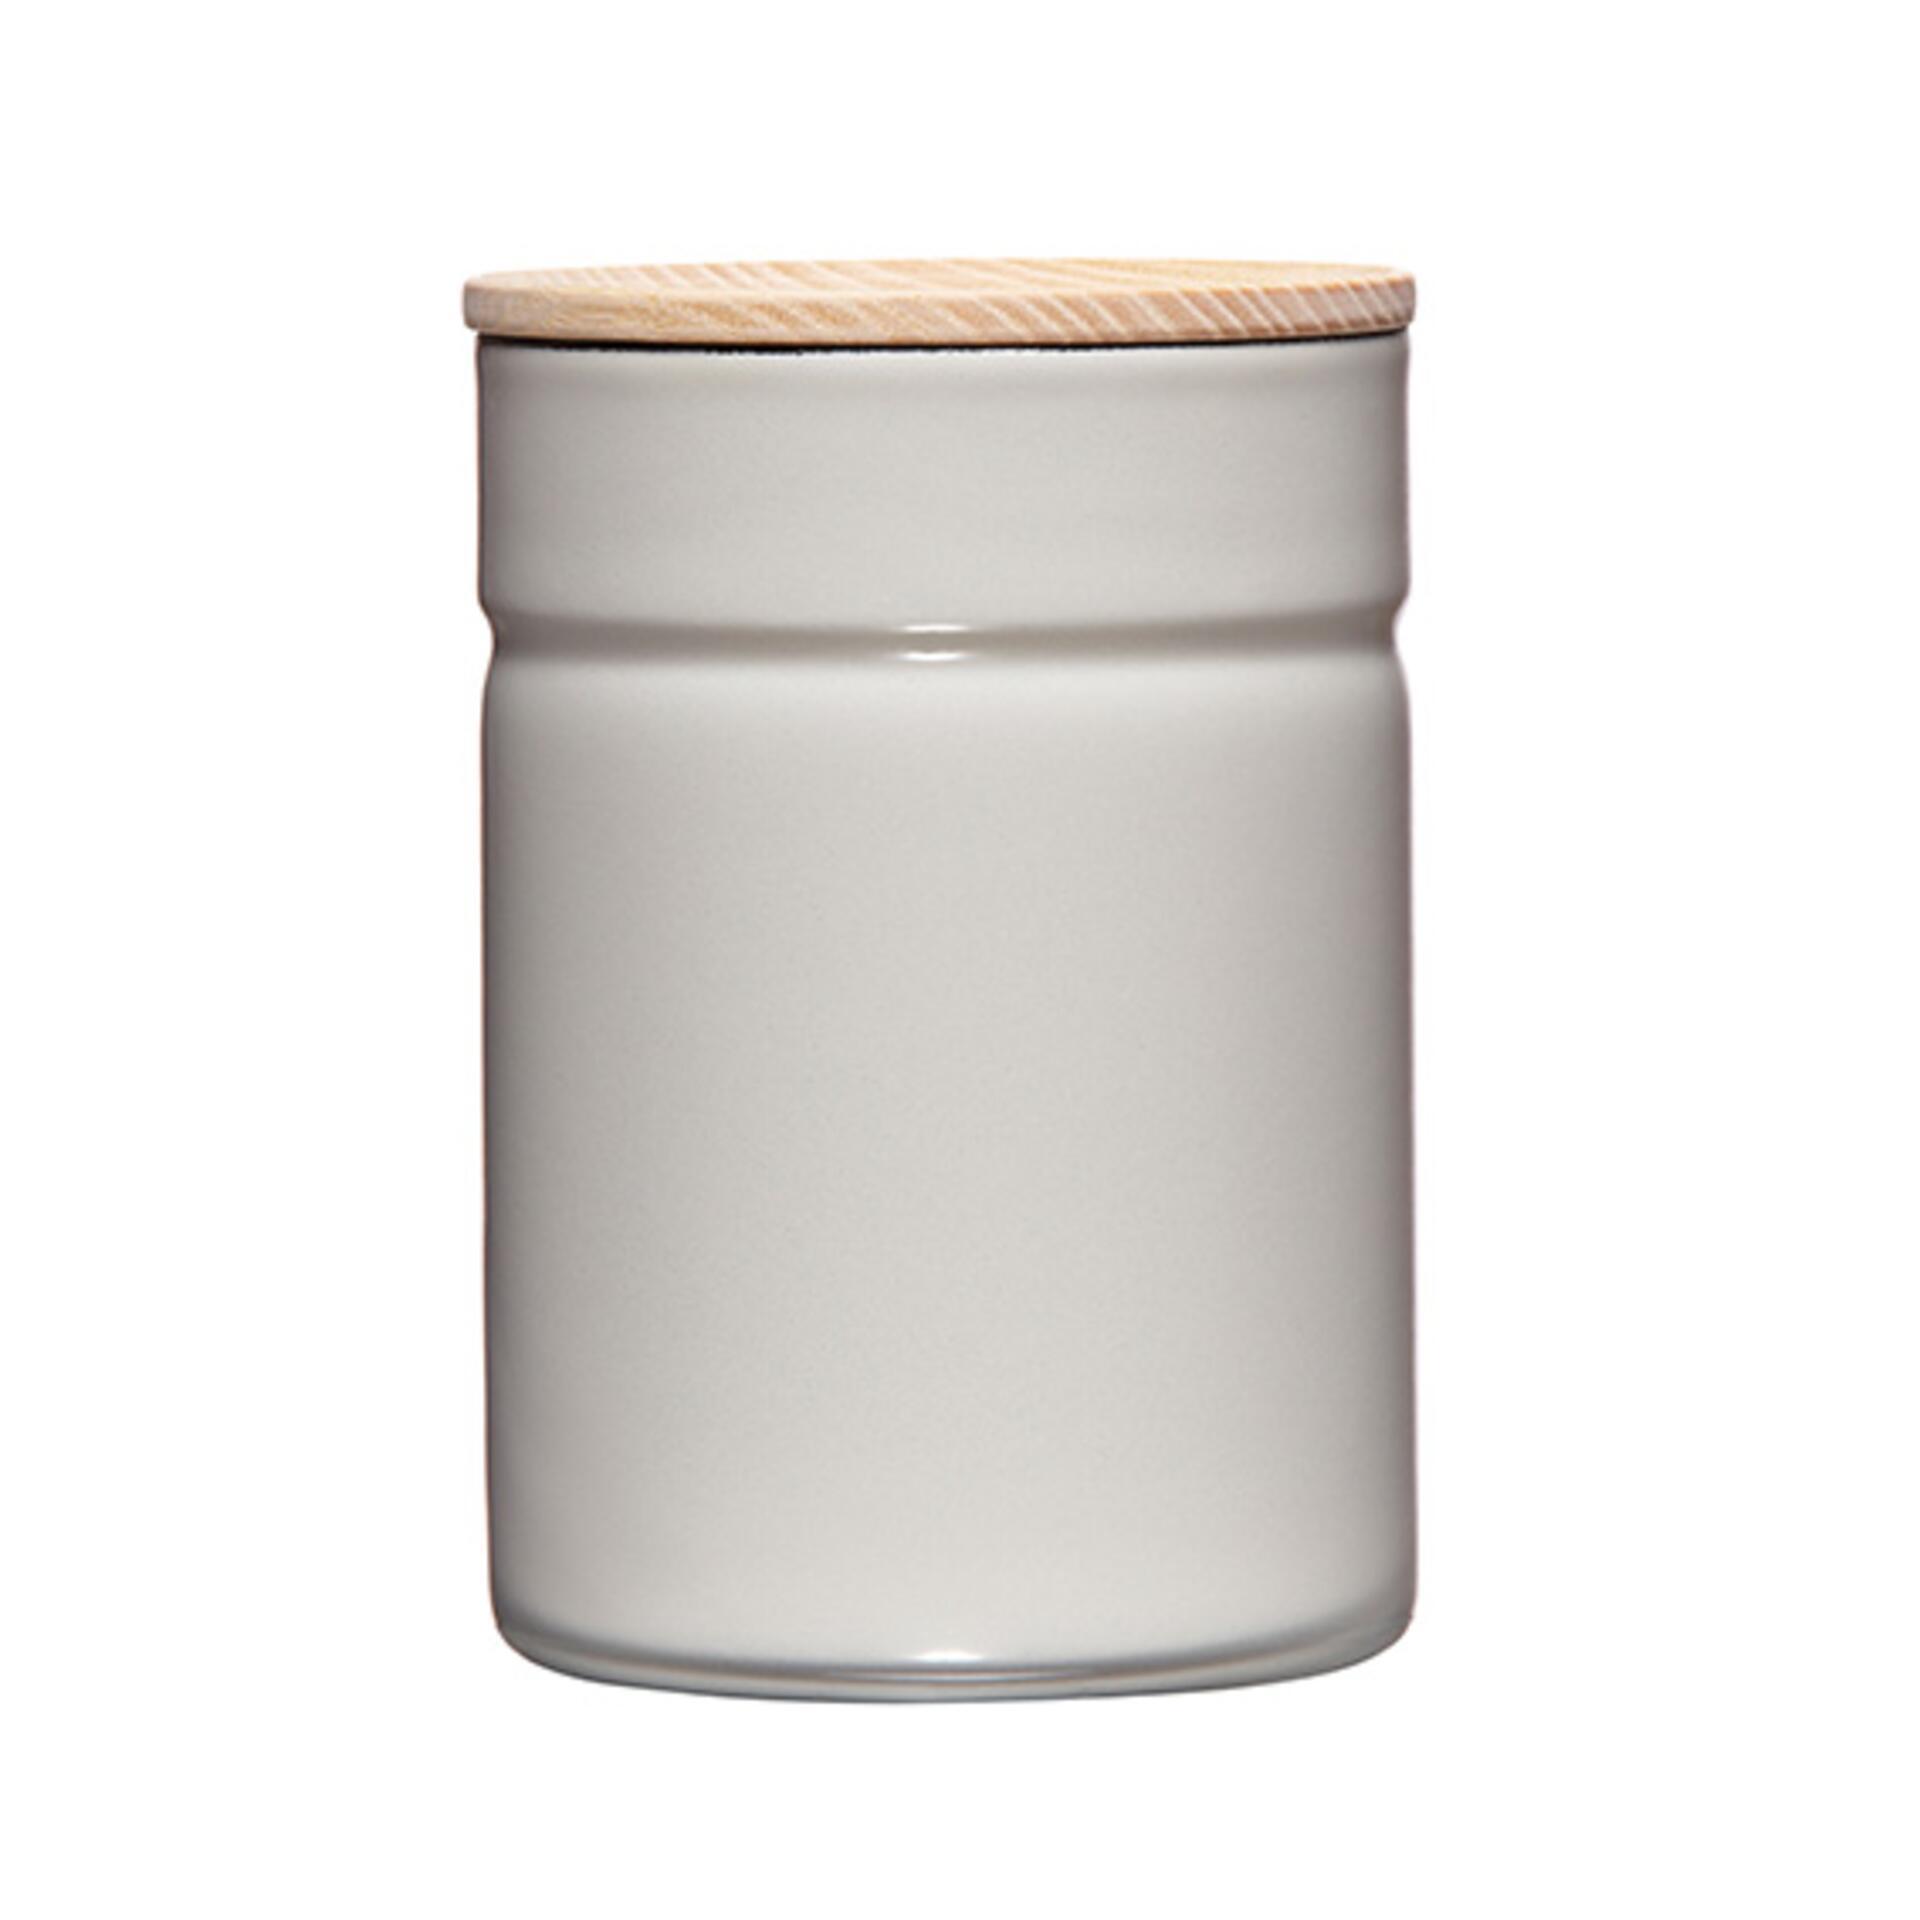 Riess Vorratsdose 525 ml Grau